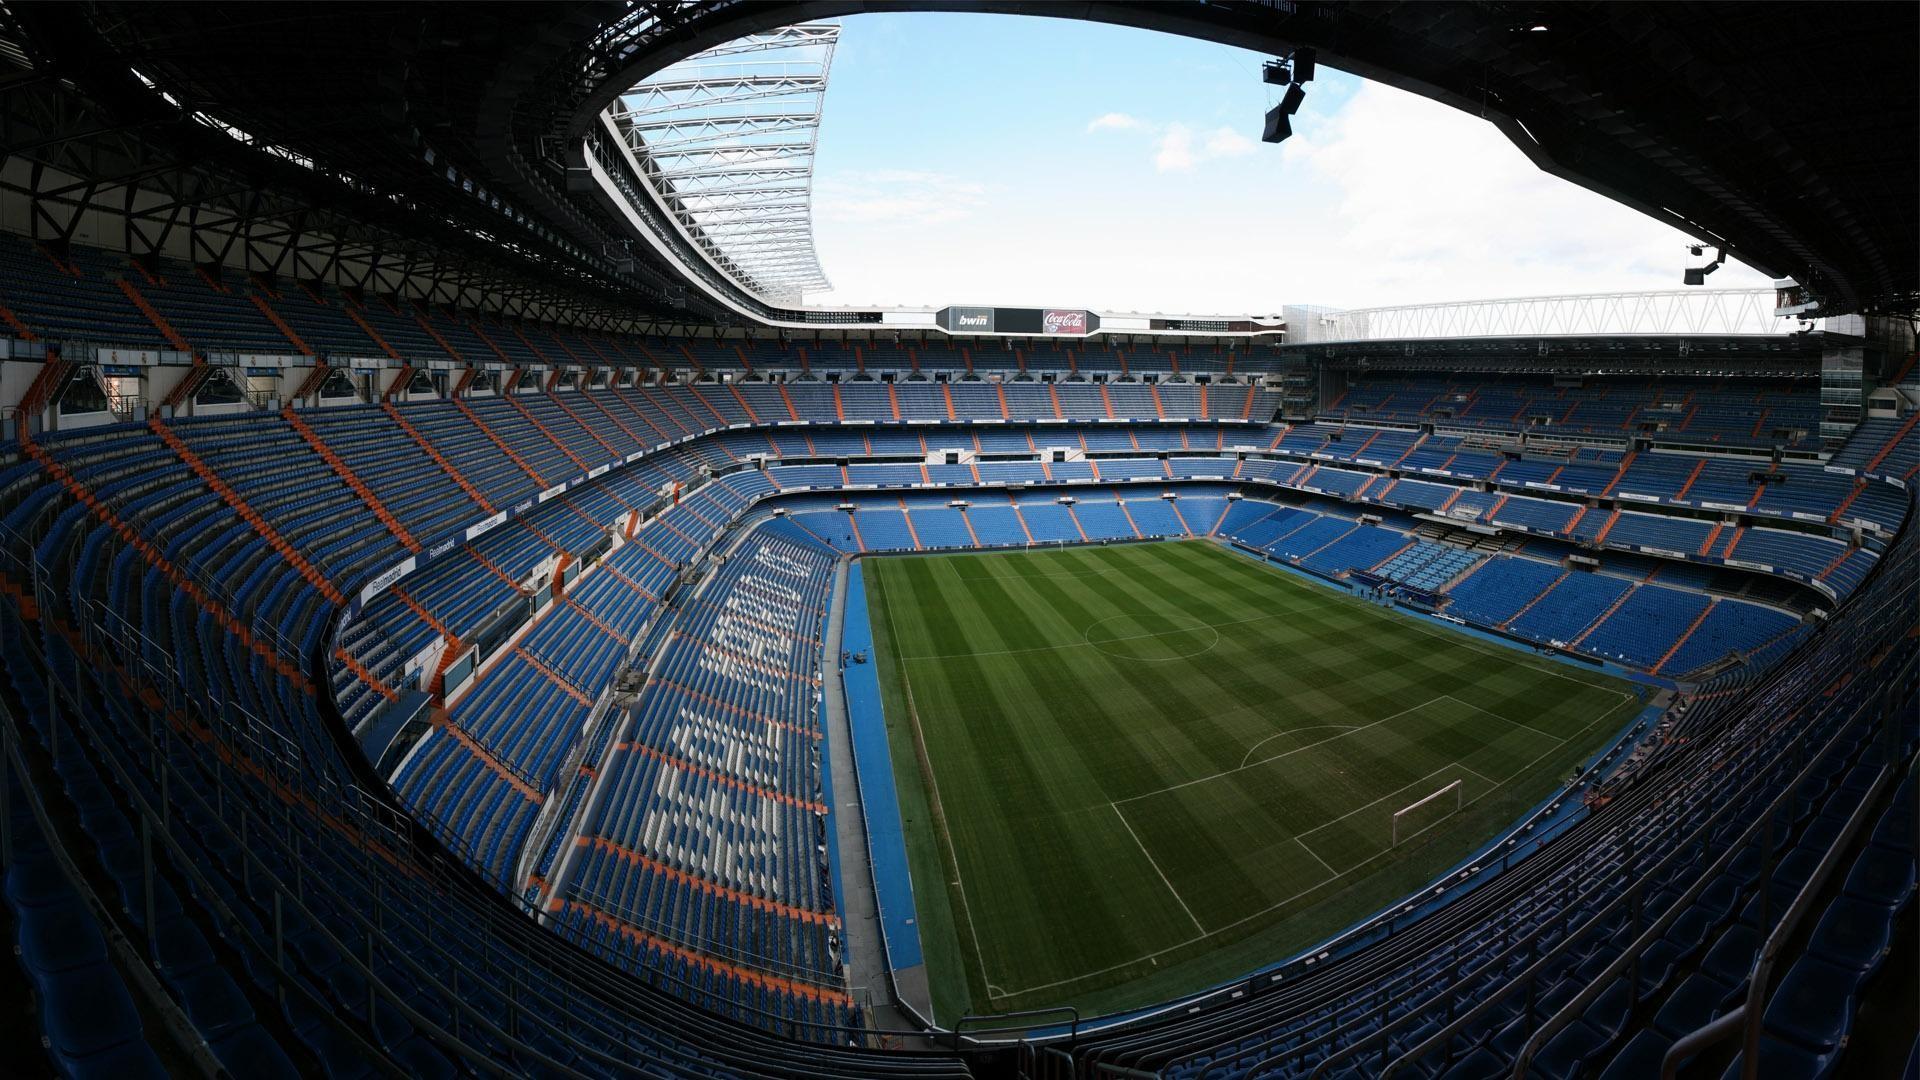 real-madrid-stadium-wallpaper-standD